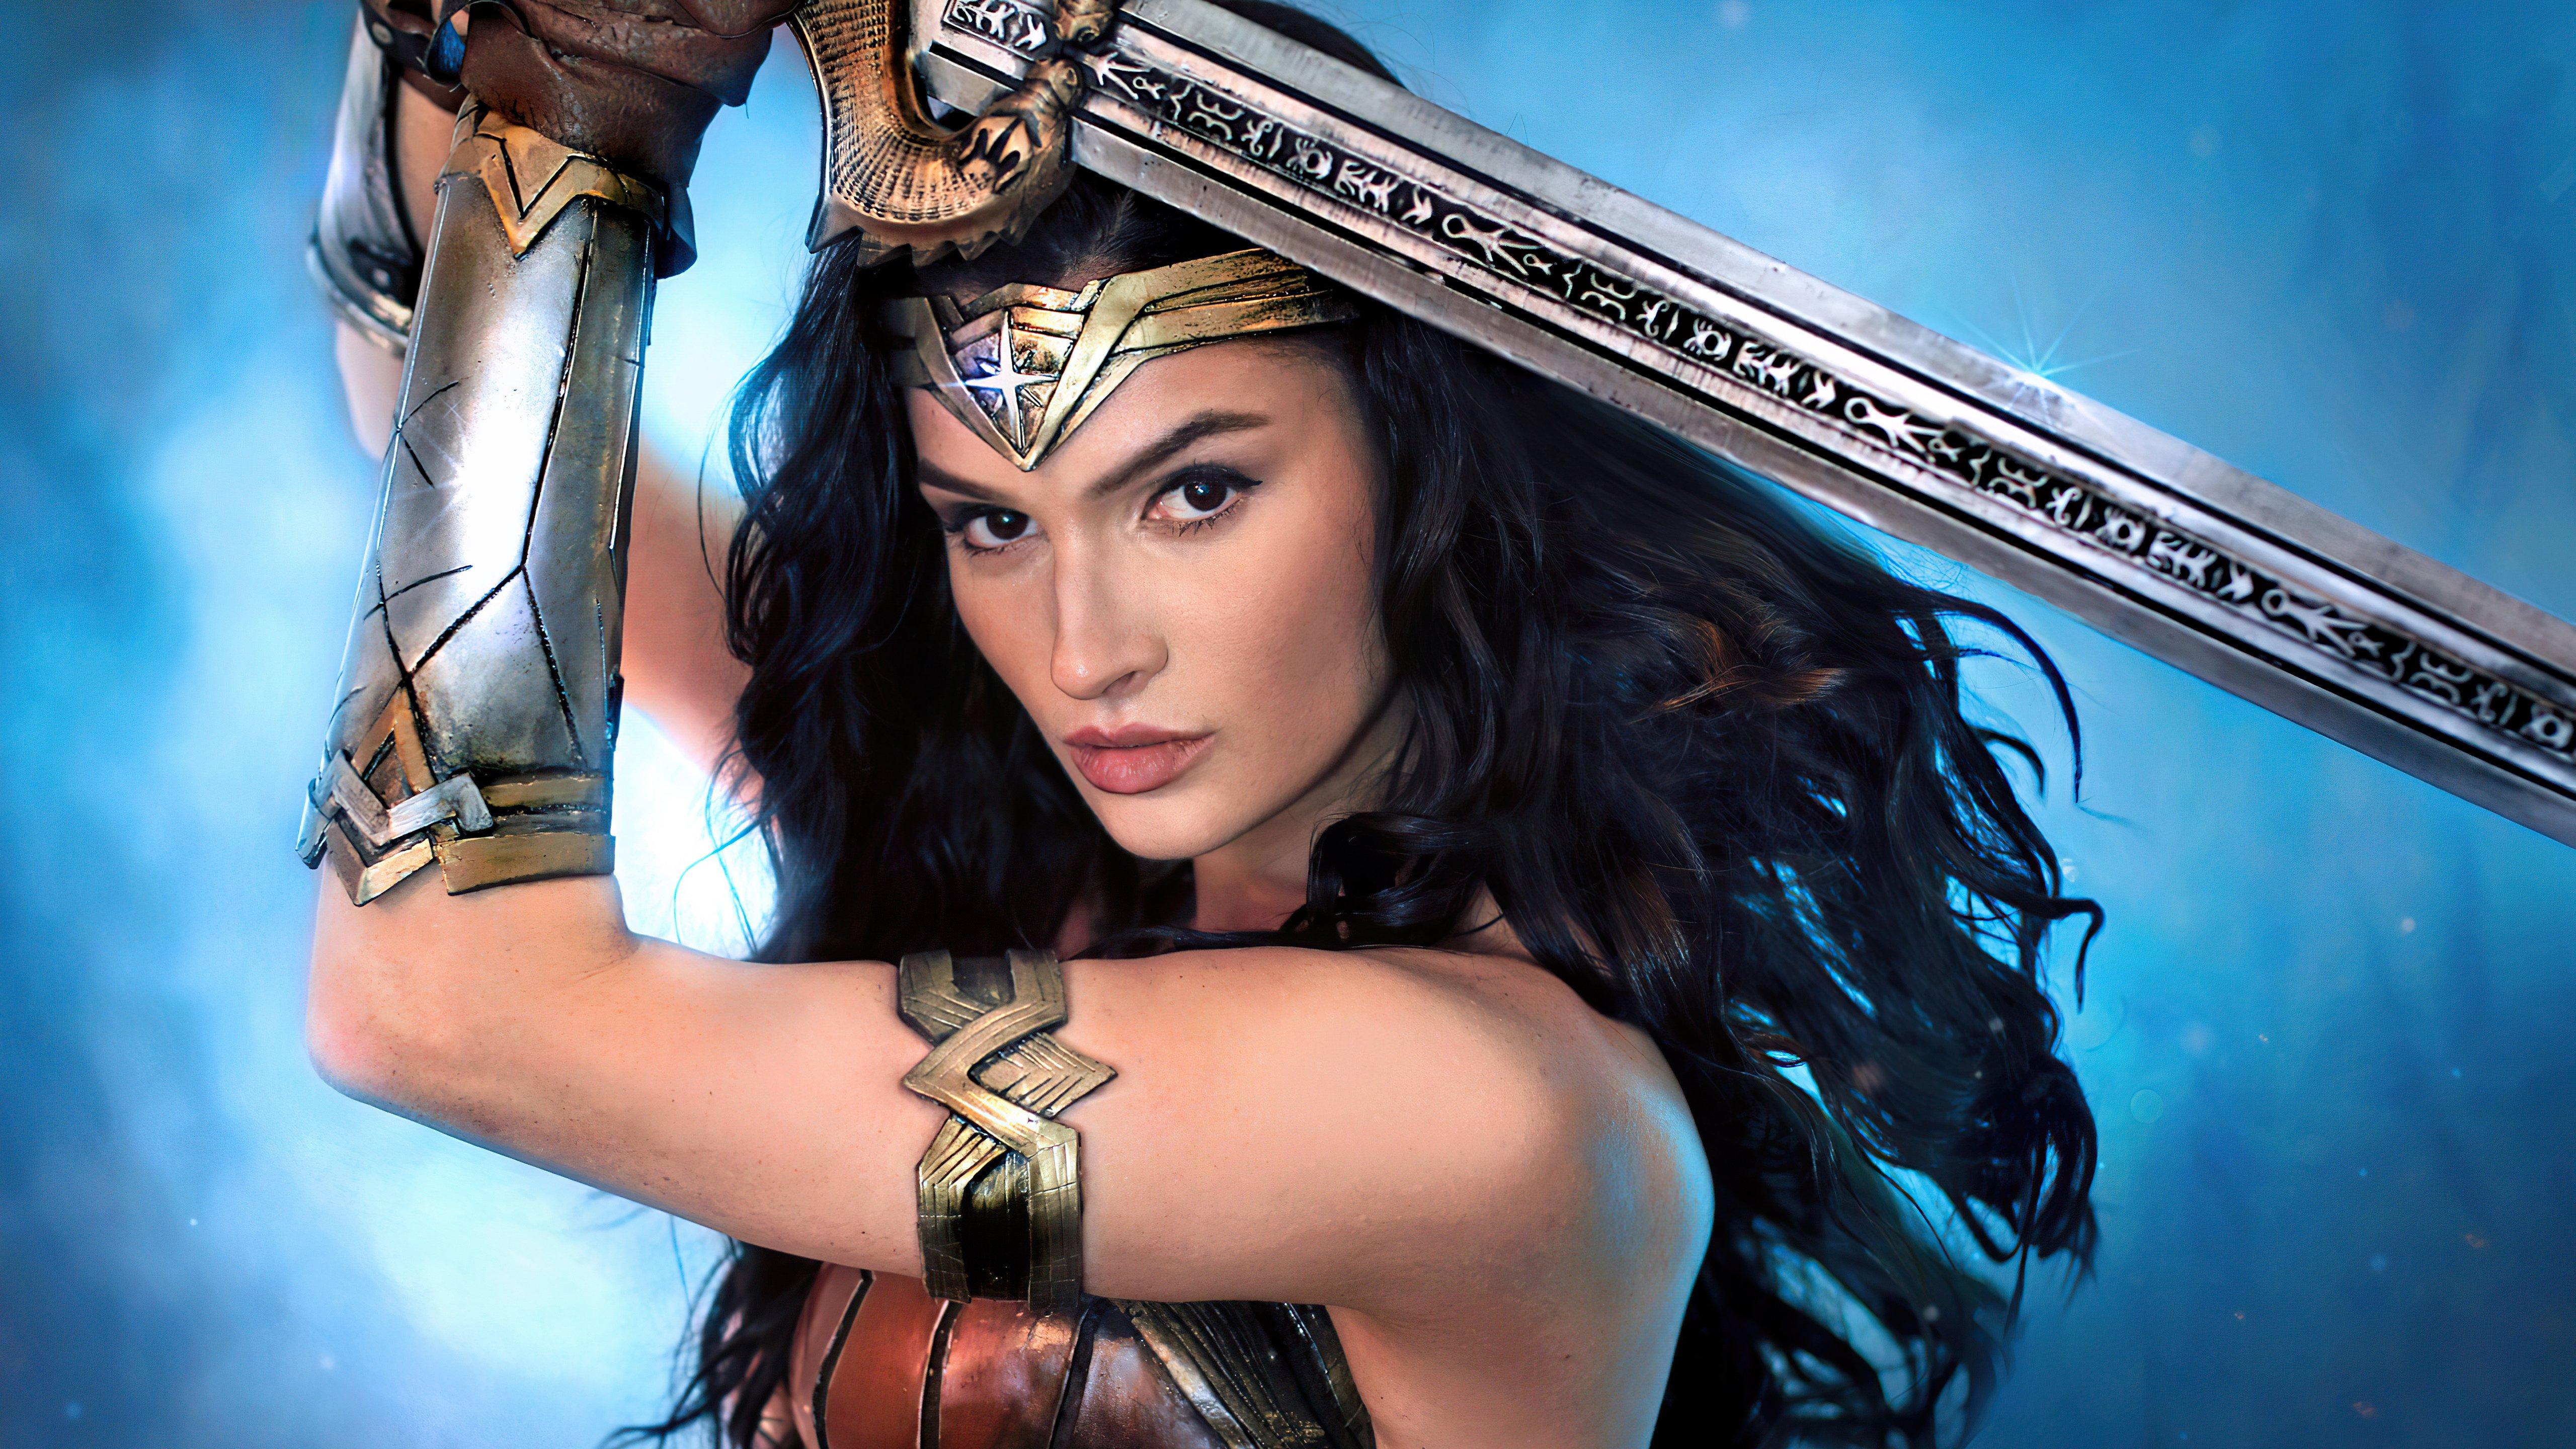 Wallpaper Wonder woman girl in cosplay